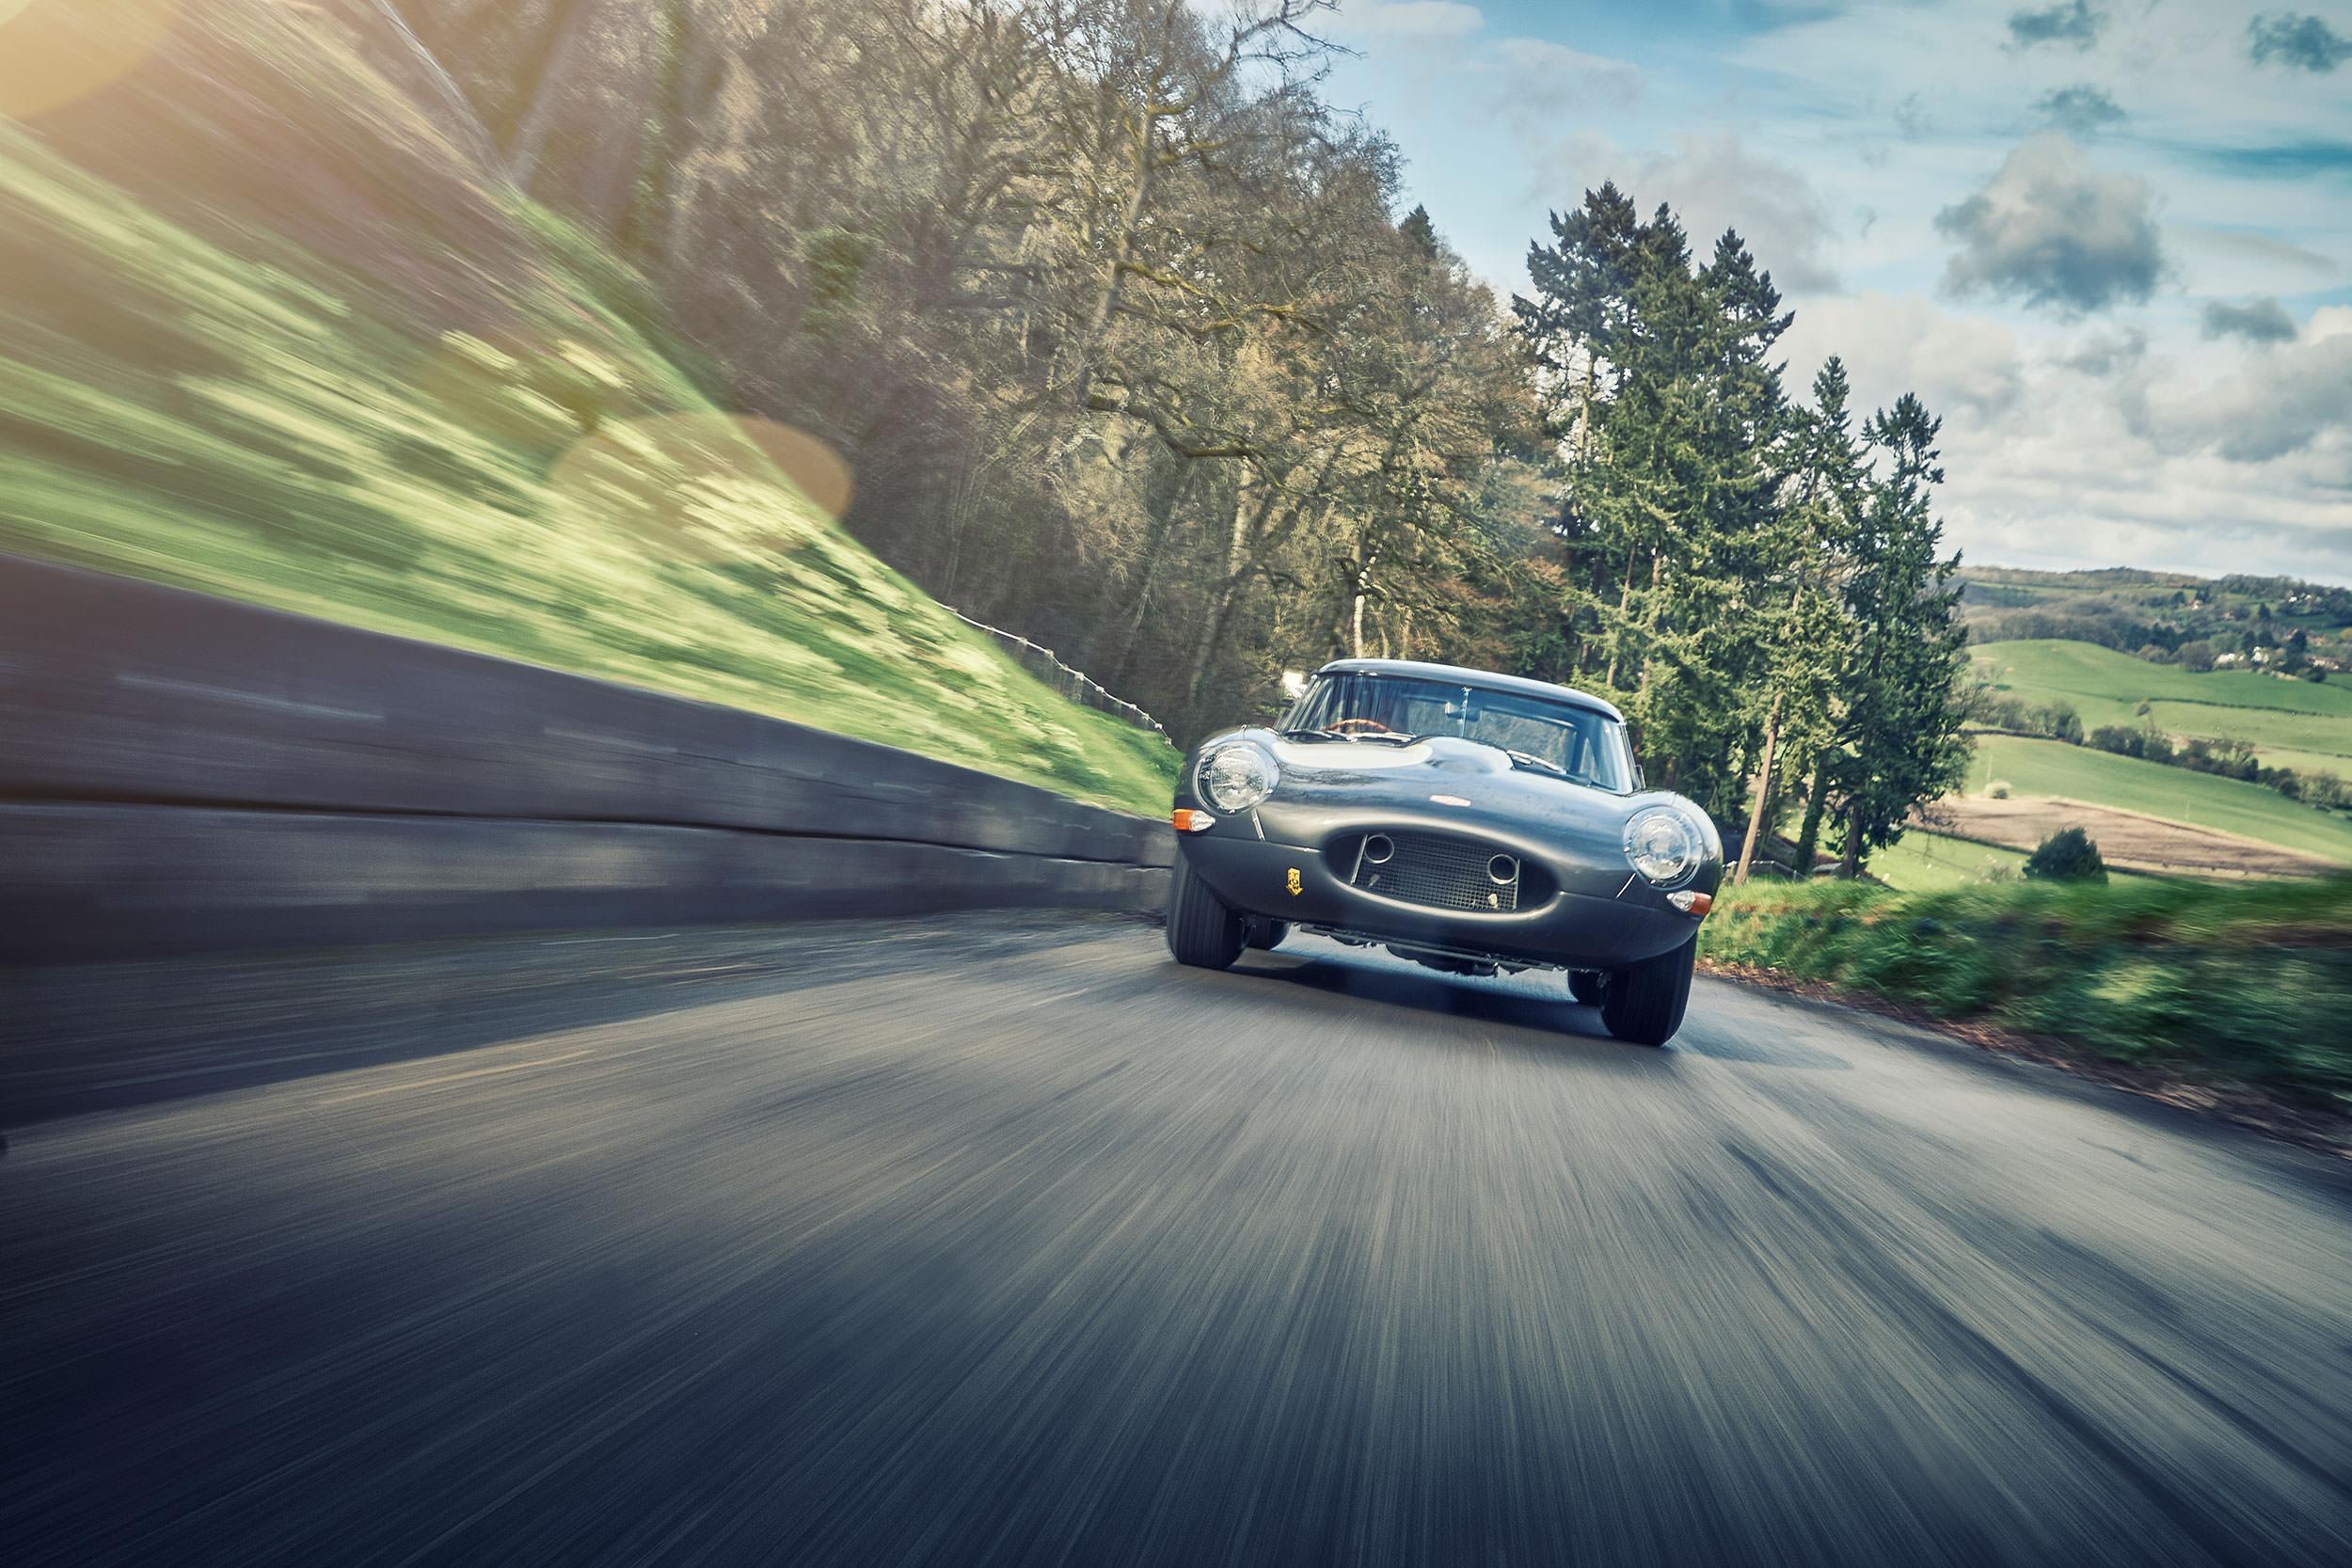 Jaguar E Type Hd Cars 4k Wallpapers Images Backgrounds Photos